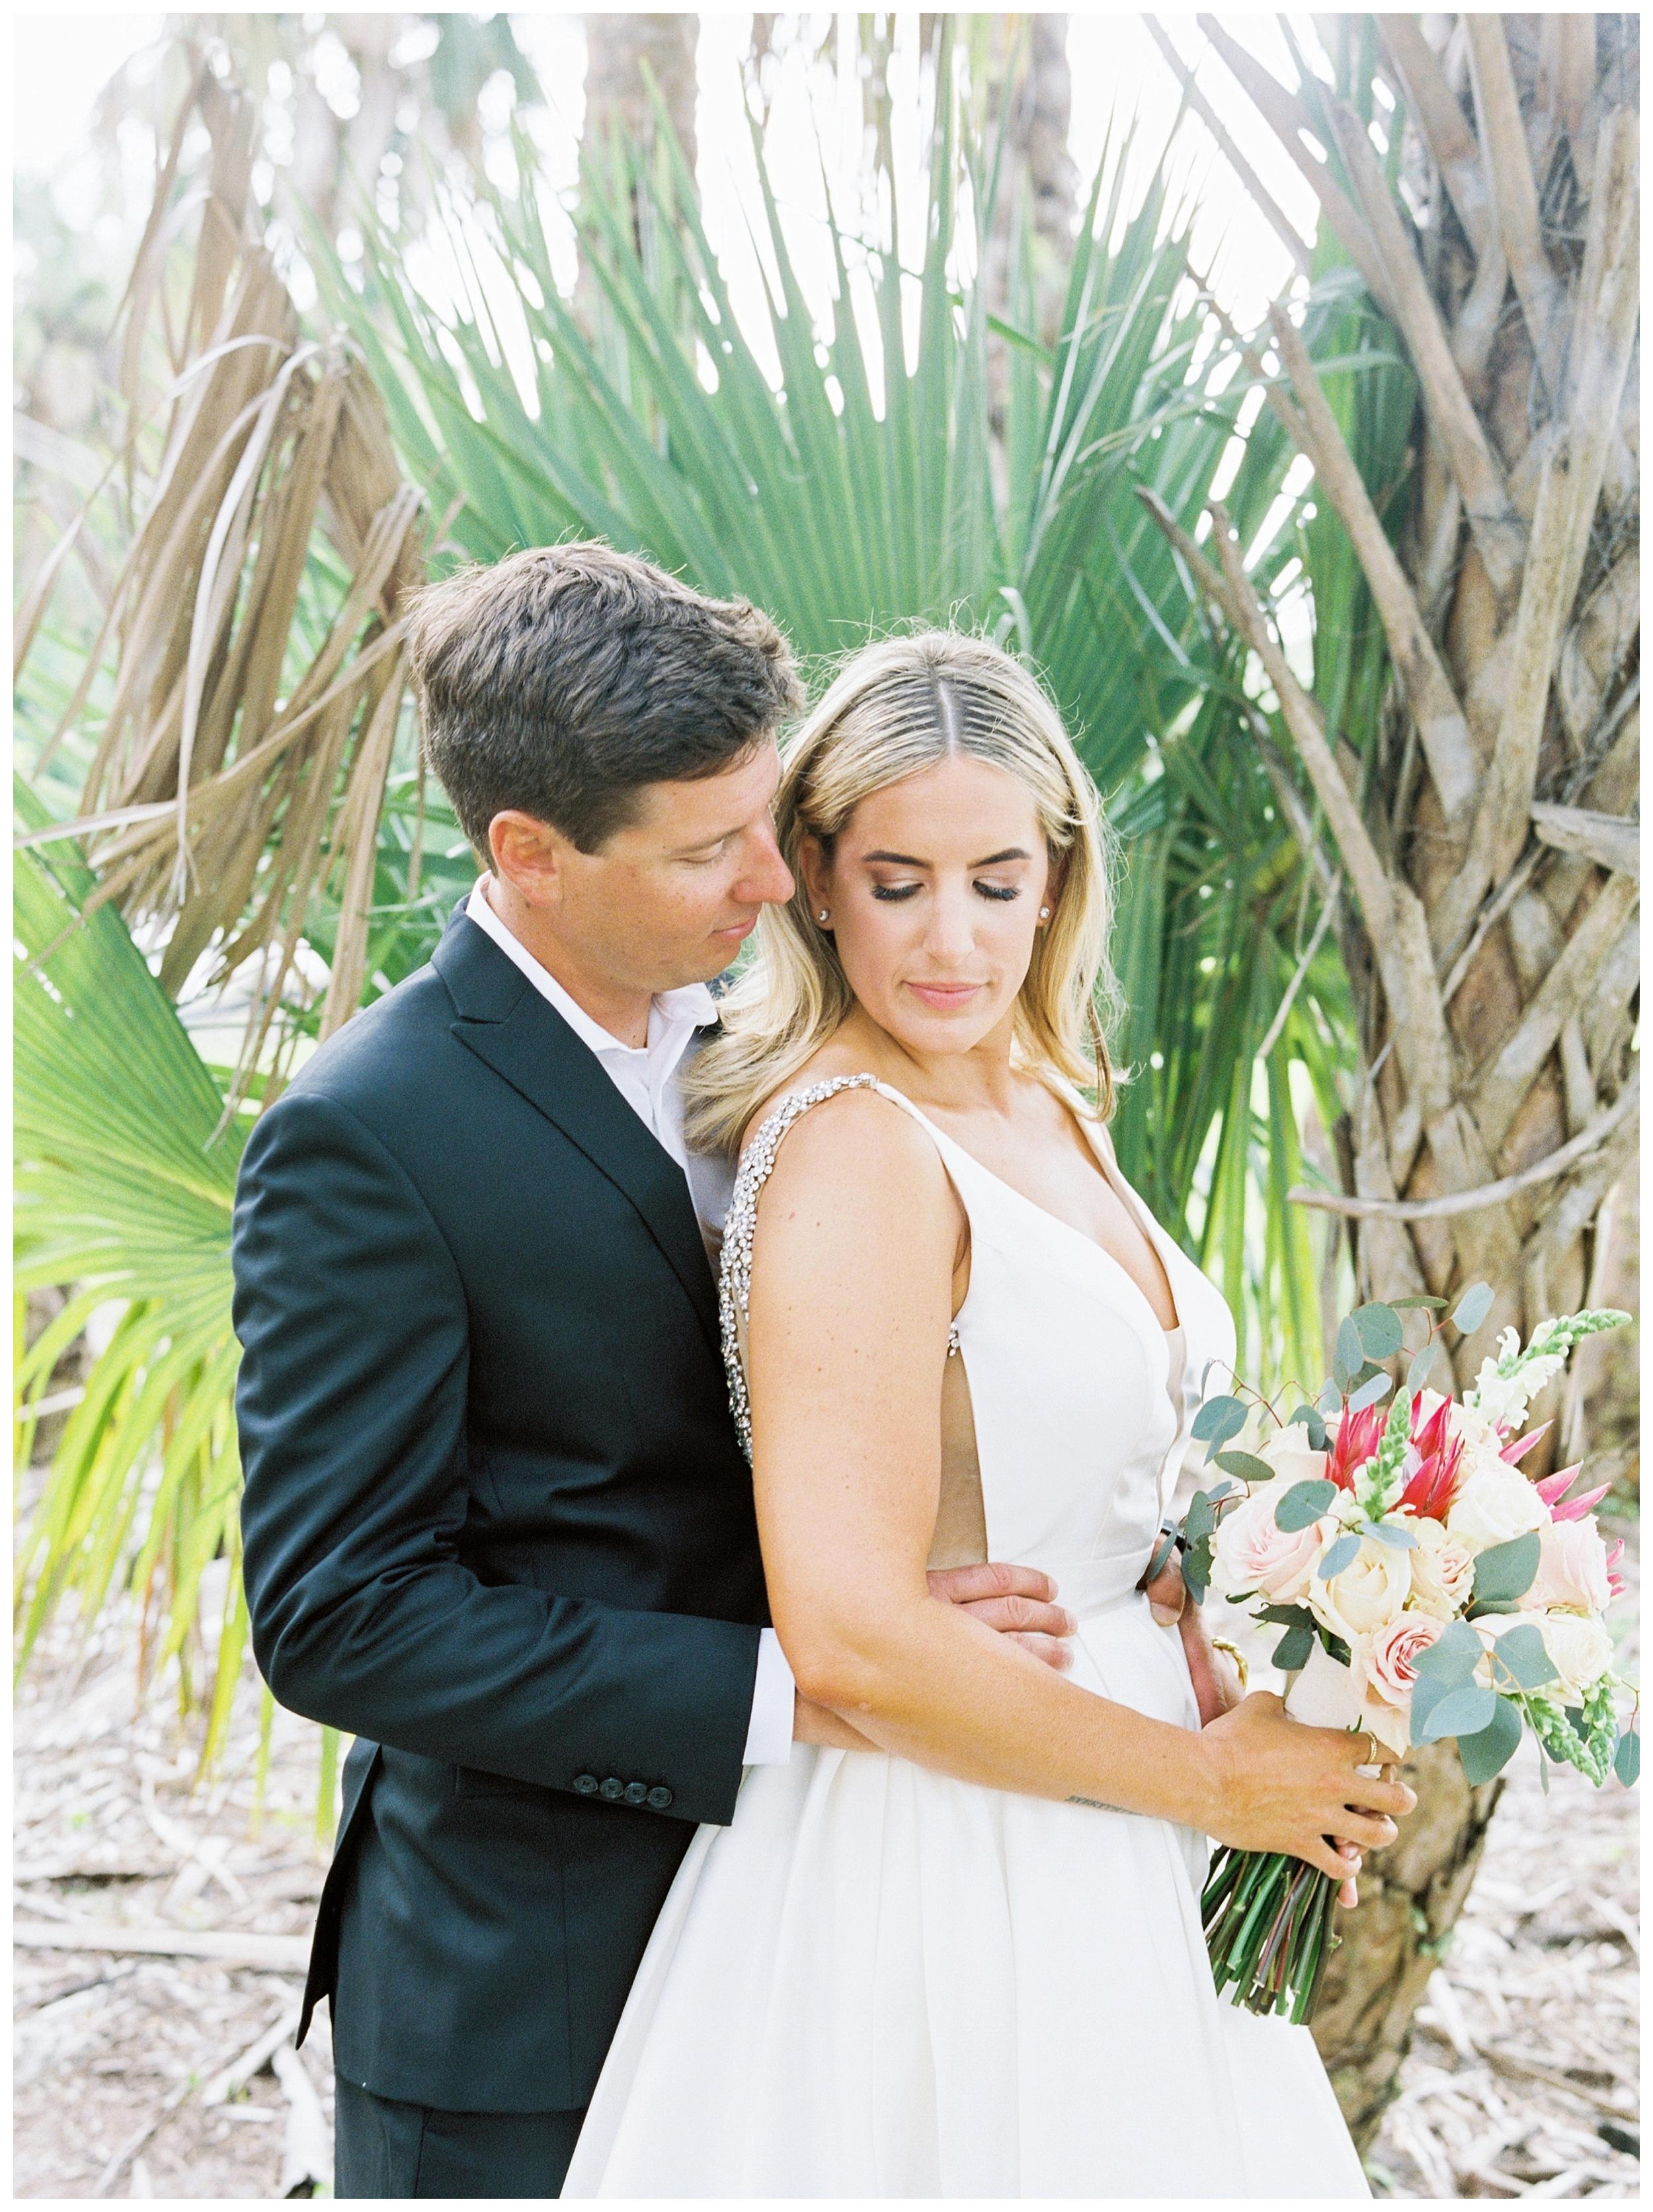 South Florida Wedding Photographer Kir Tuben_0036.jpg